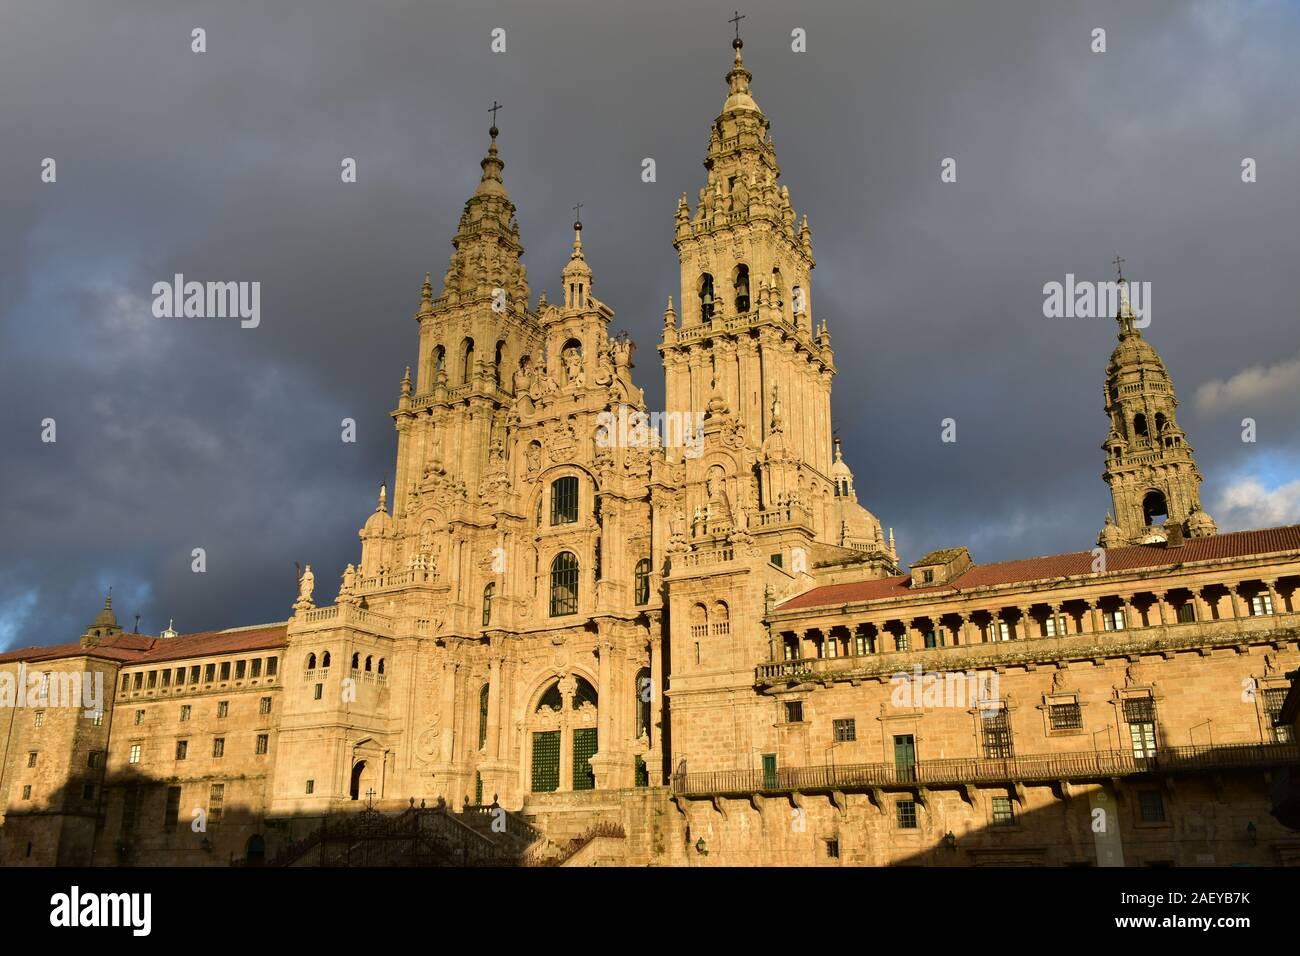 Catedral con la luz del atardecer en un día lluvioso. Vista desde la Praza do Obradoiro. Santiago de Compostela, España. Foto de stock